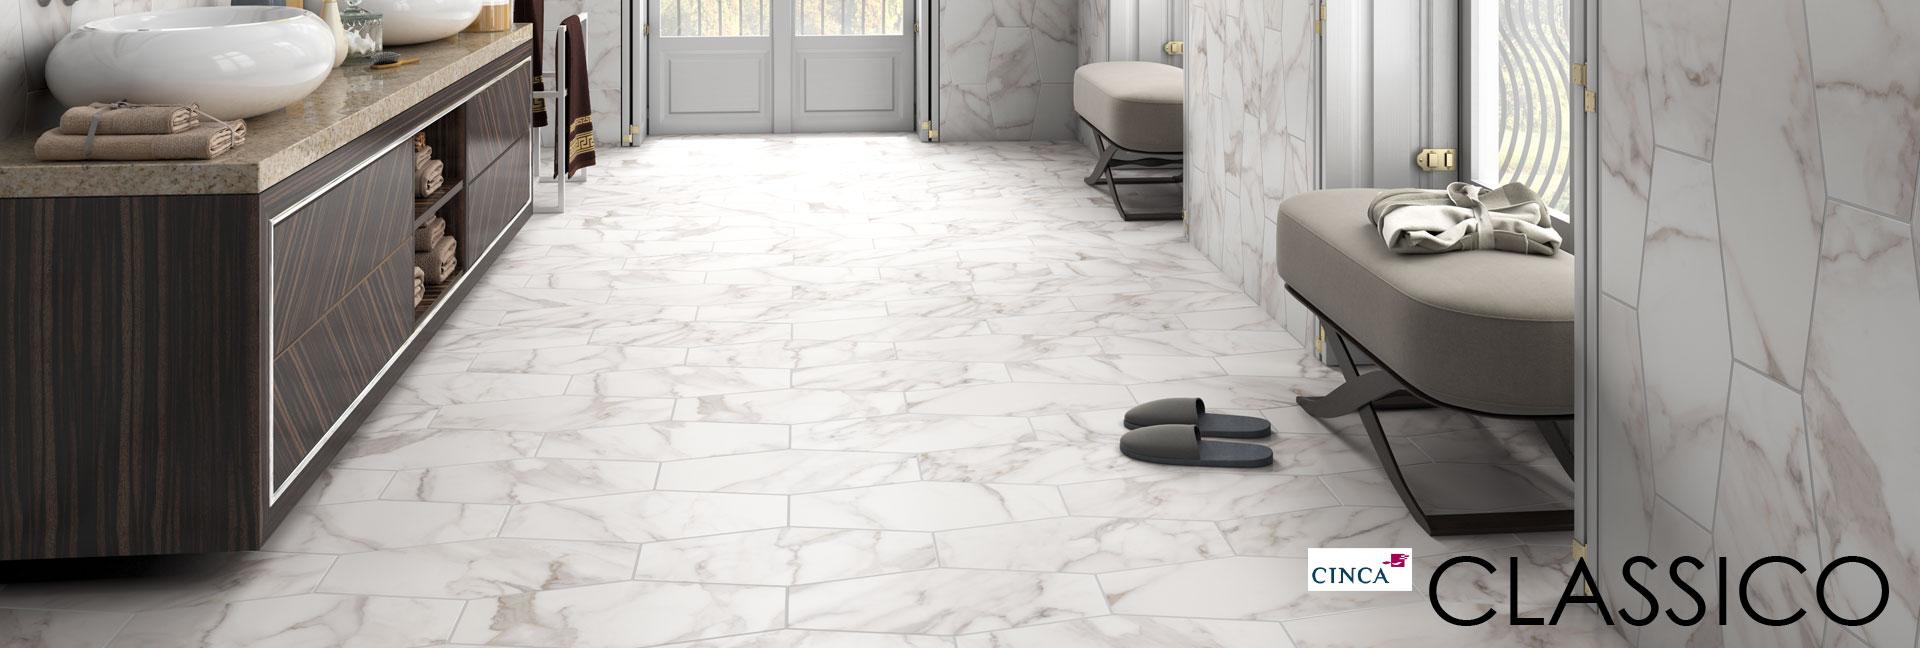 Cinca Classico Porcelain Tile